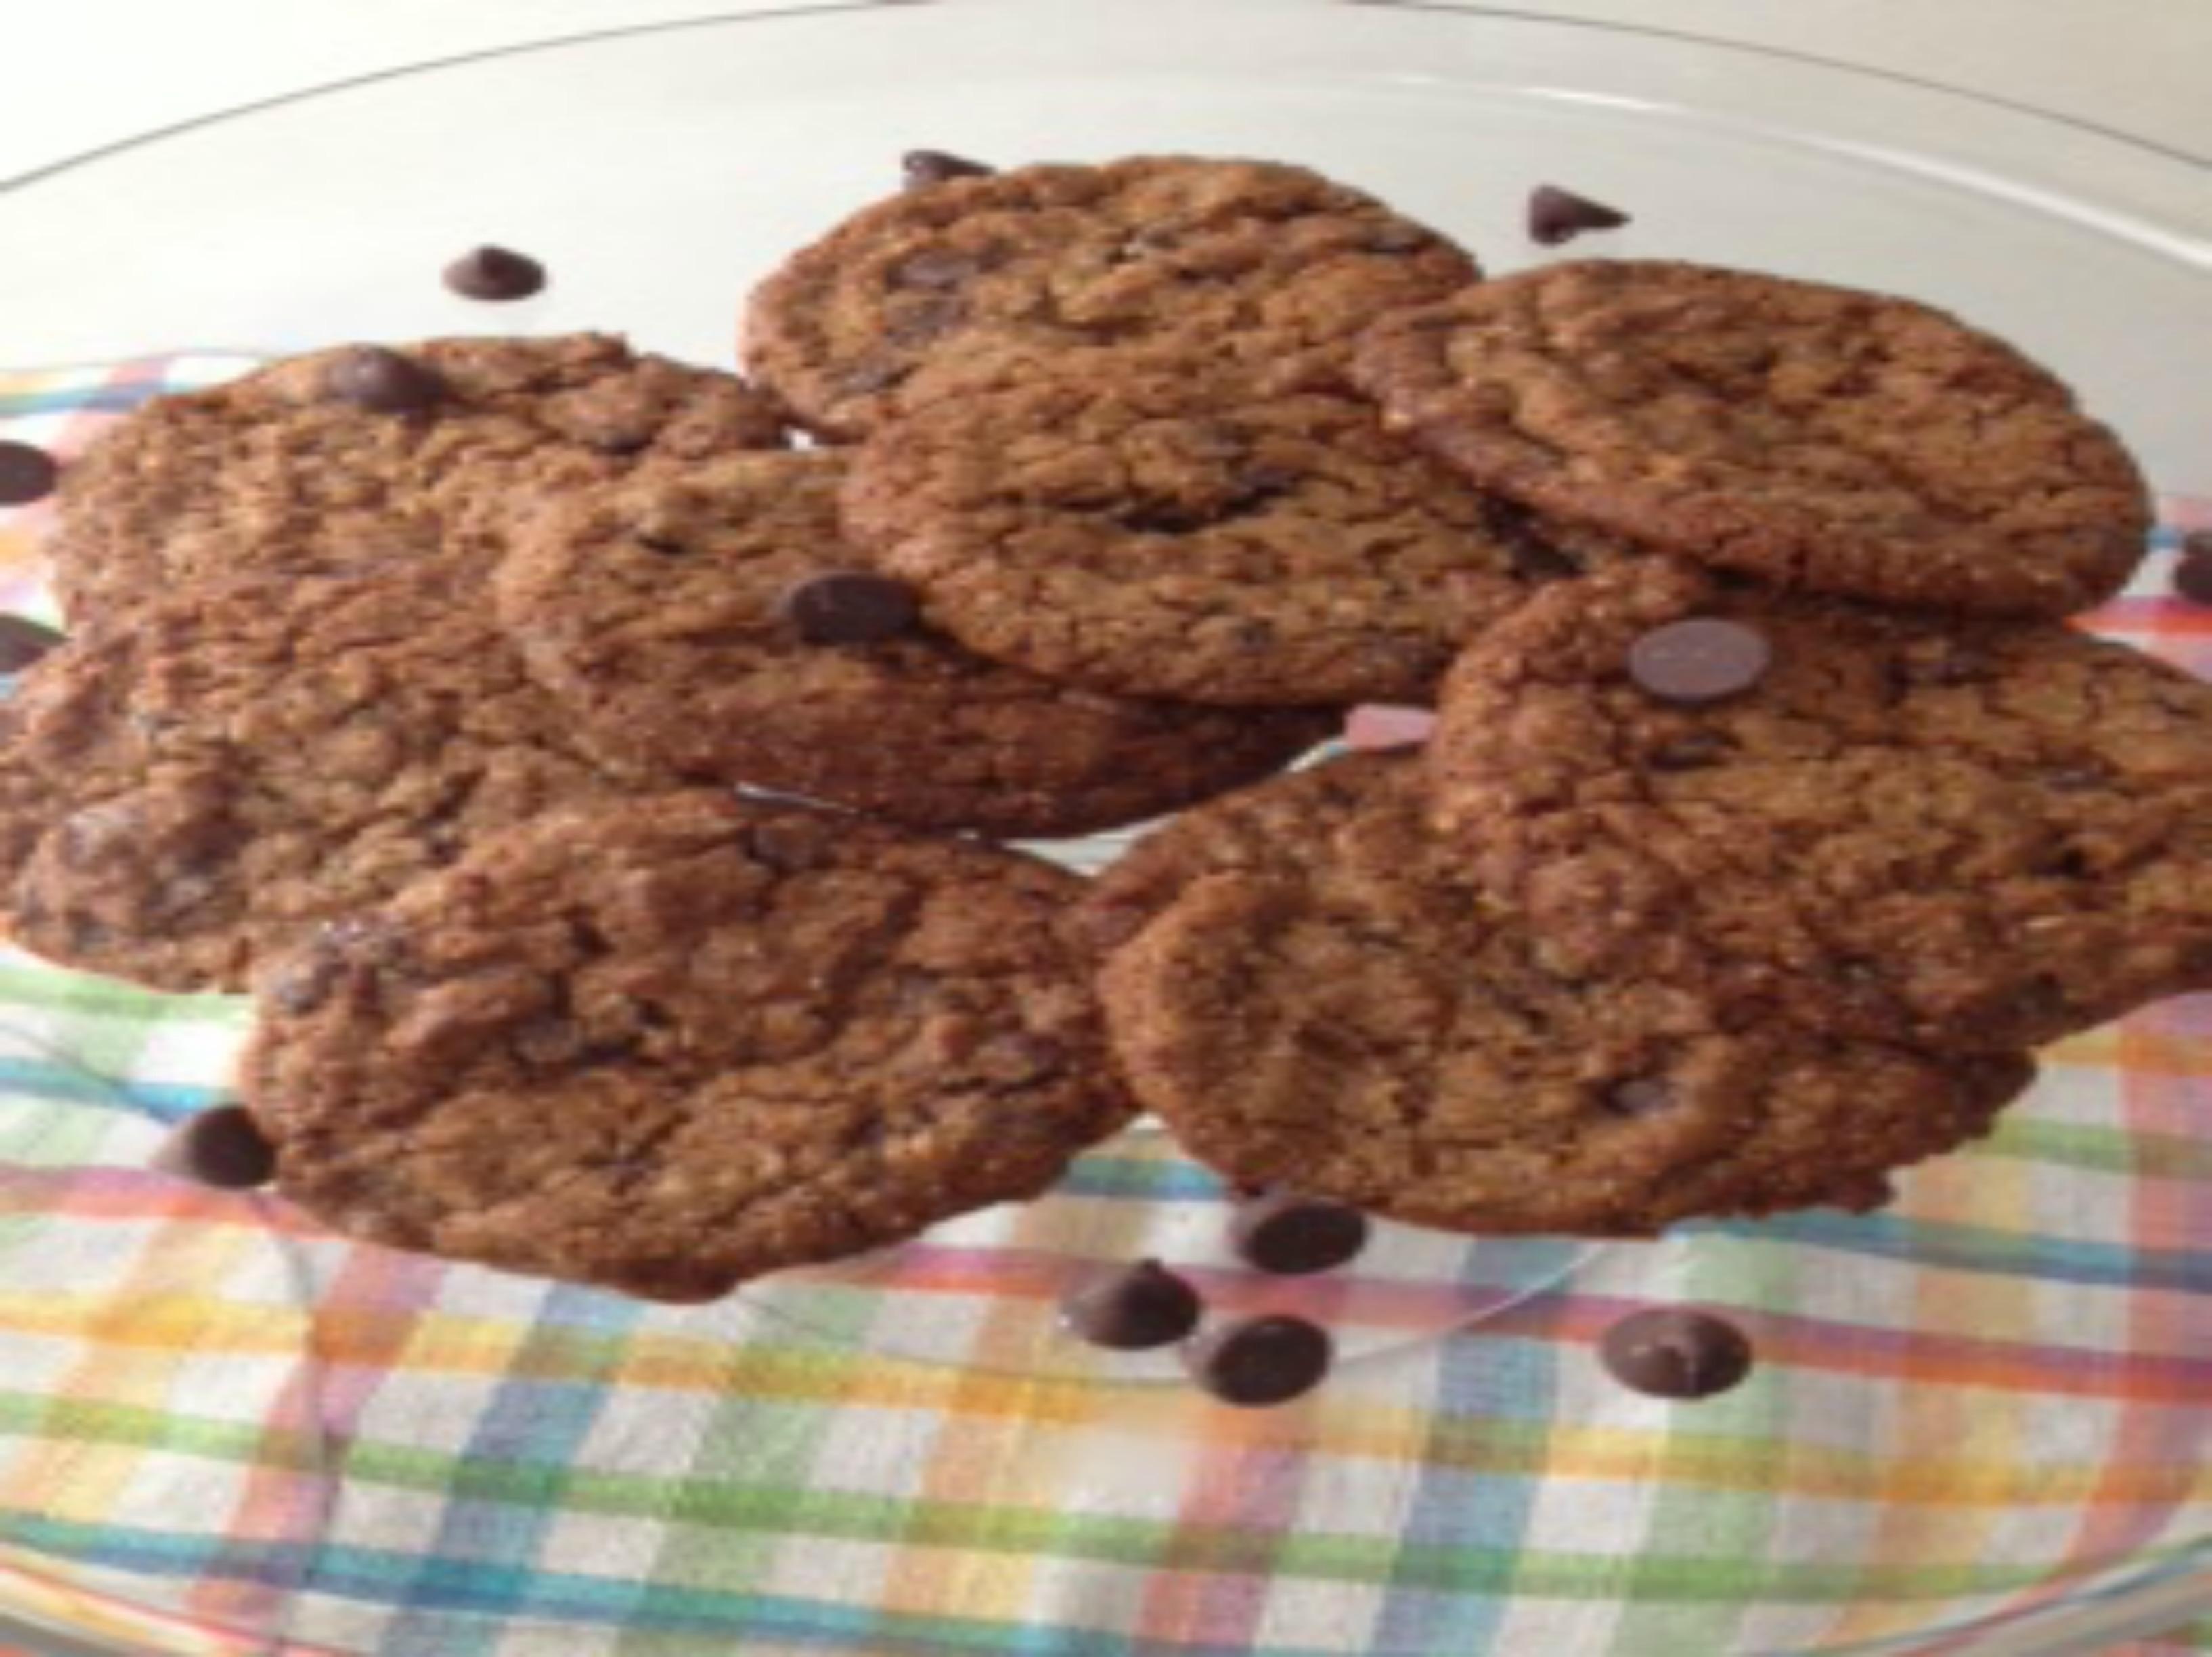 Inspiring Kitchen Paleoful cookies